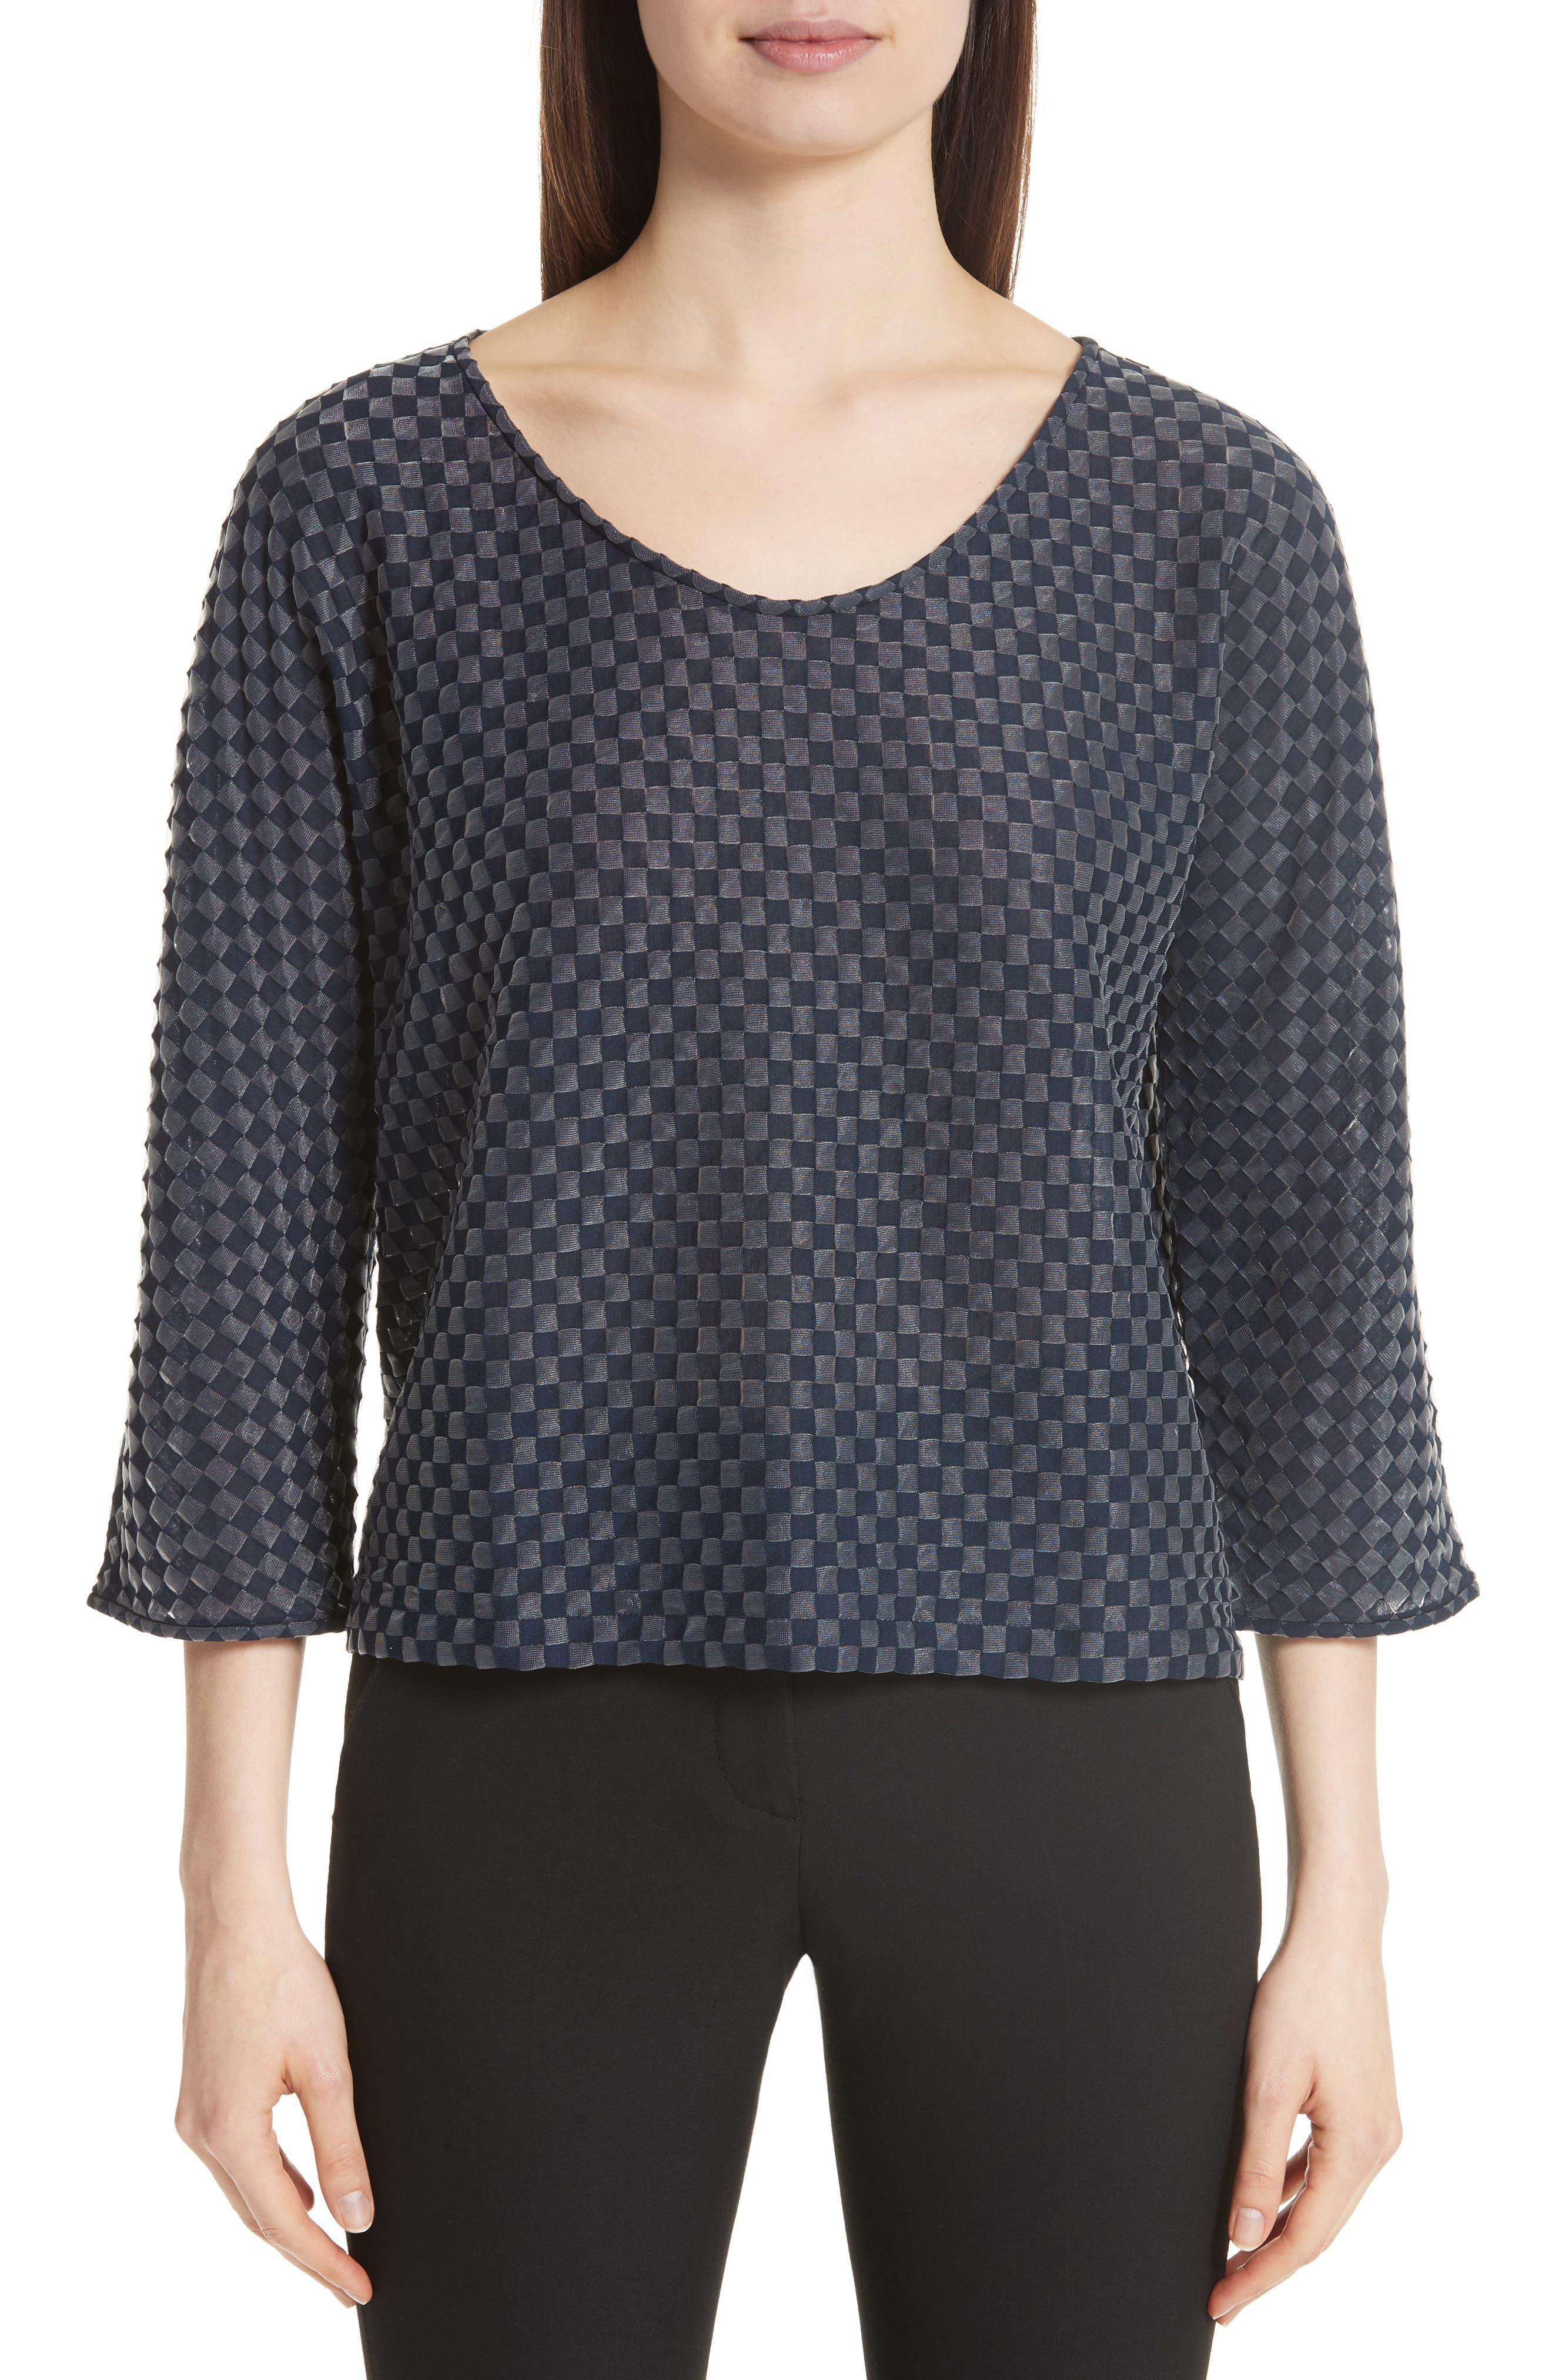 Emporio Armani Checkerboard Print Jersey Top